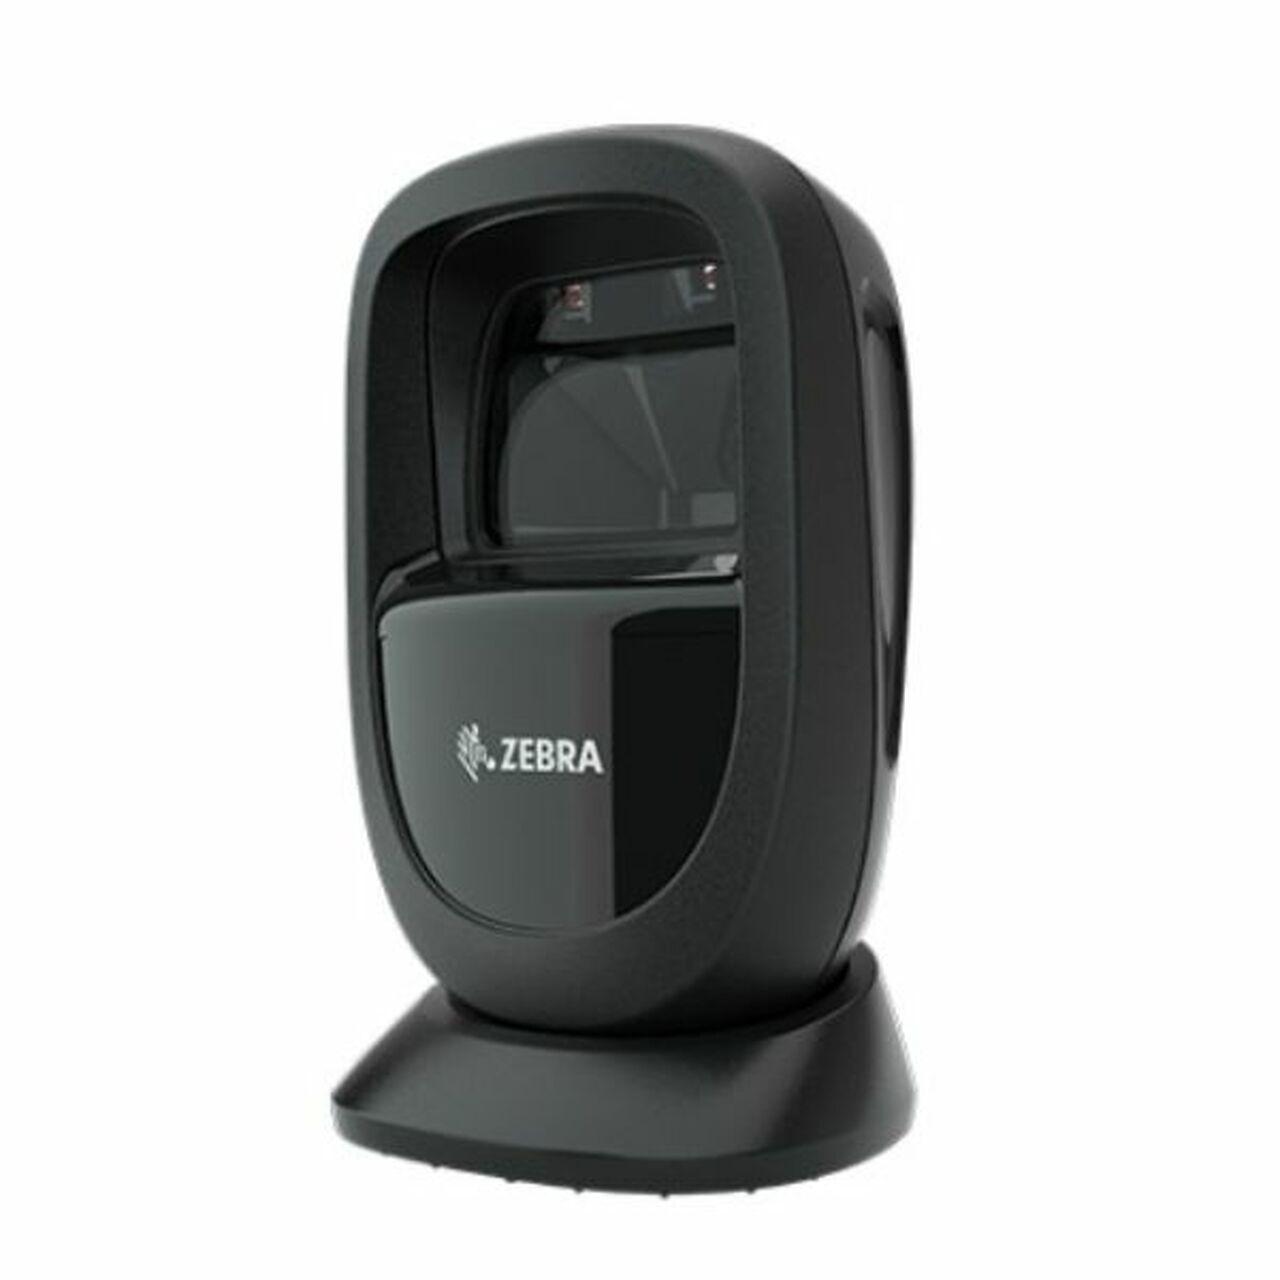 LEITOR DS9308 FIXO KIT USB - 2D